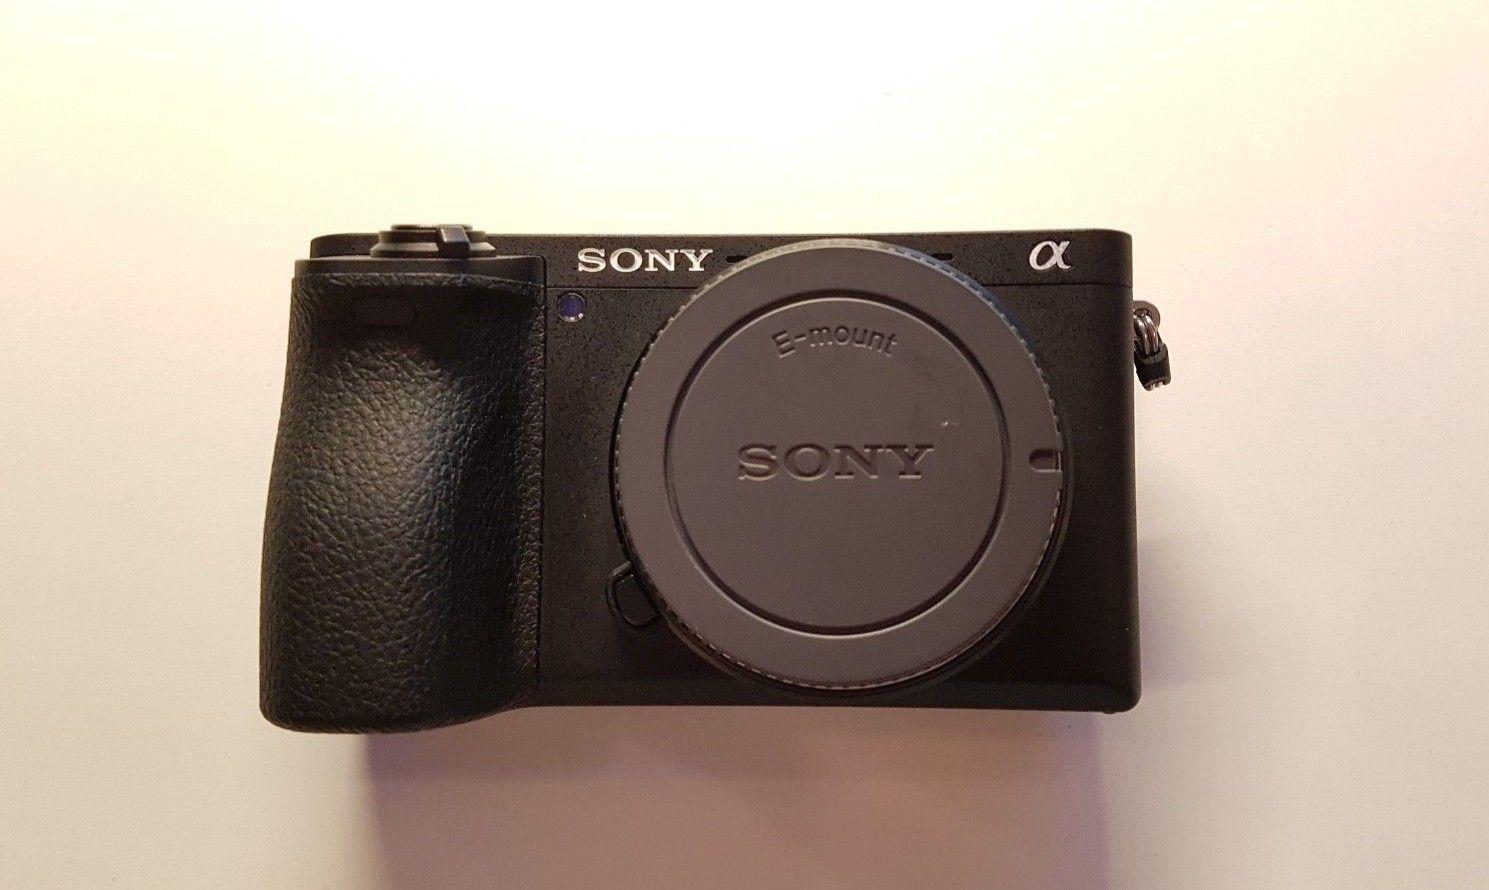 Sony Alpha ILCE-6500 24.2 MP Digitalkamera (A6500) (Nur Body) (TOP!!!)